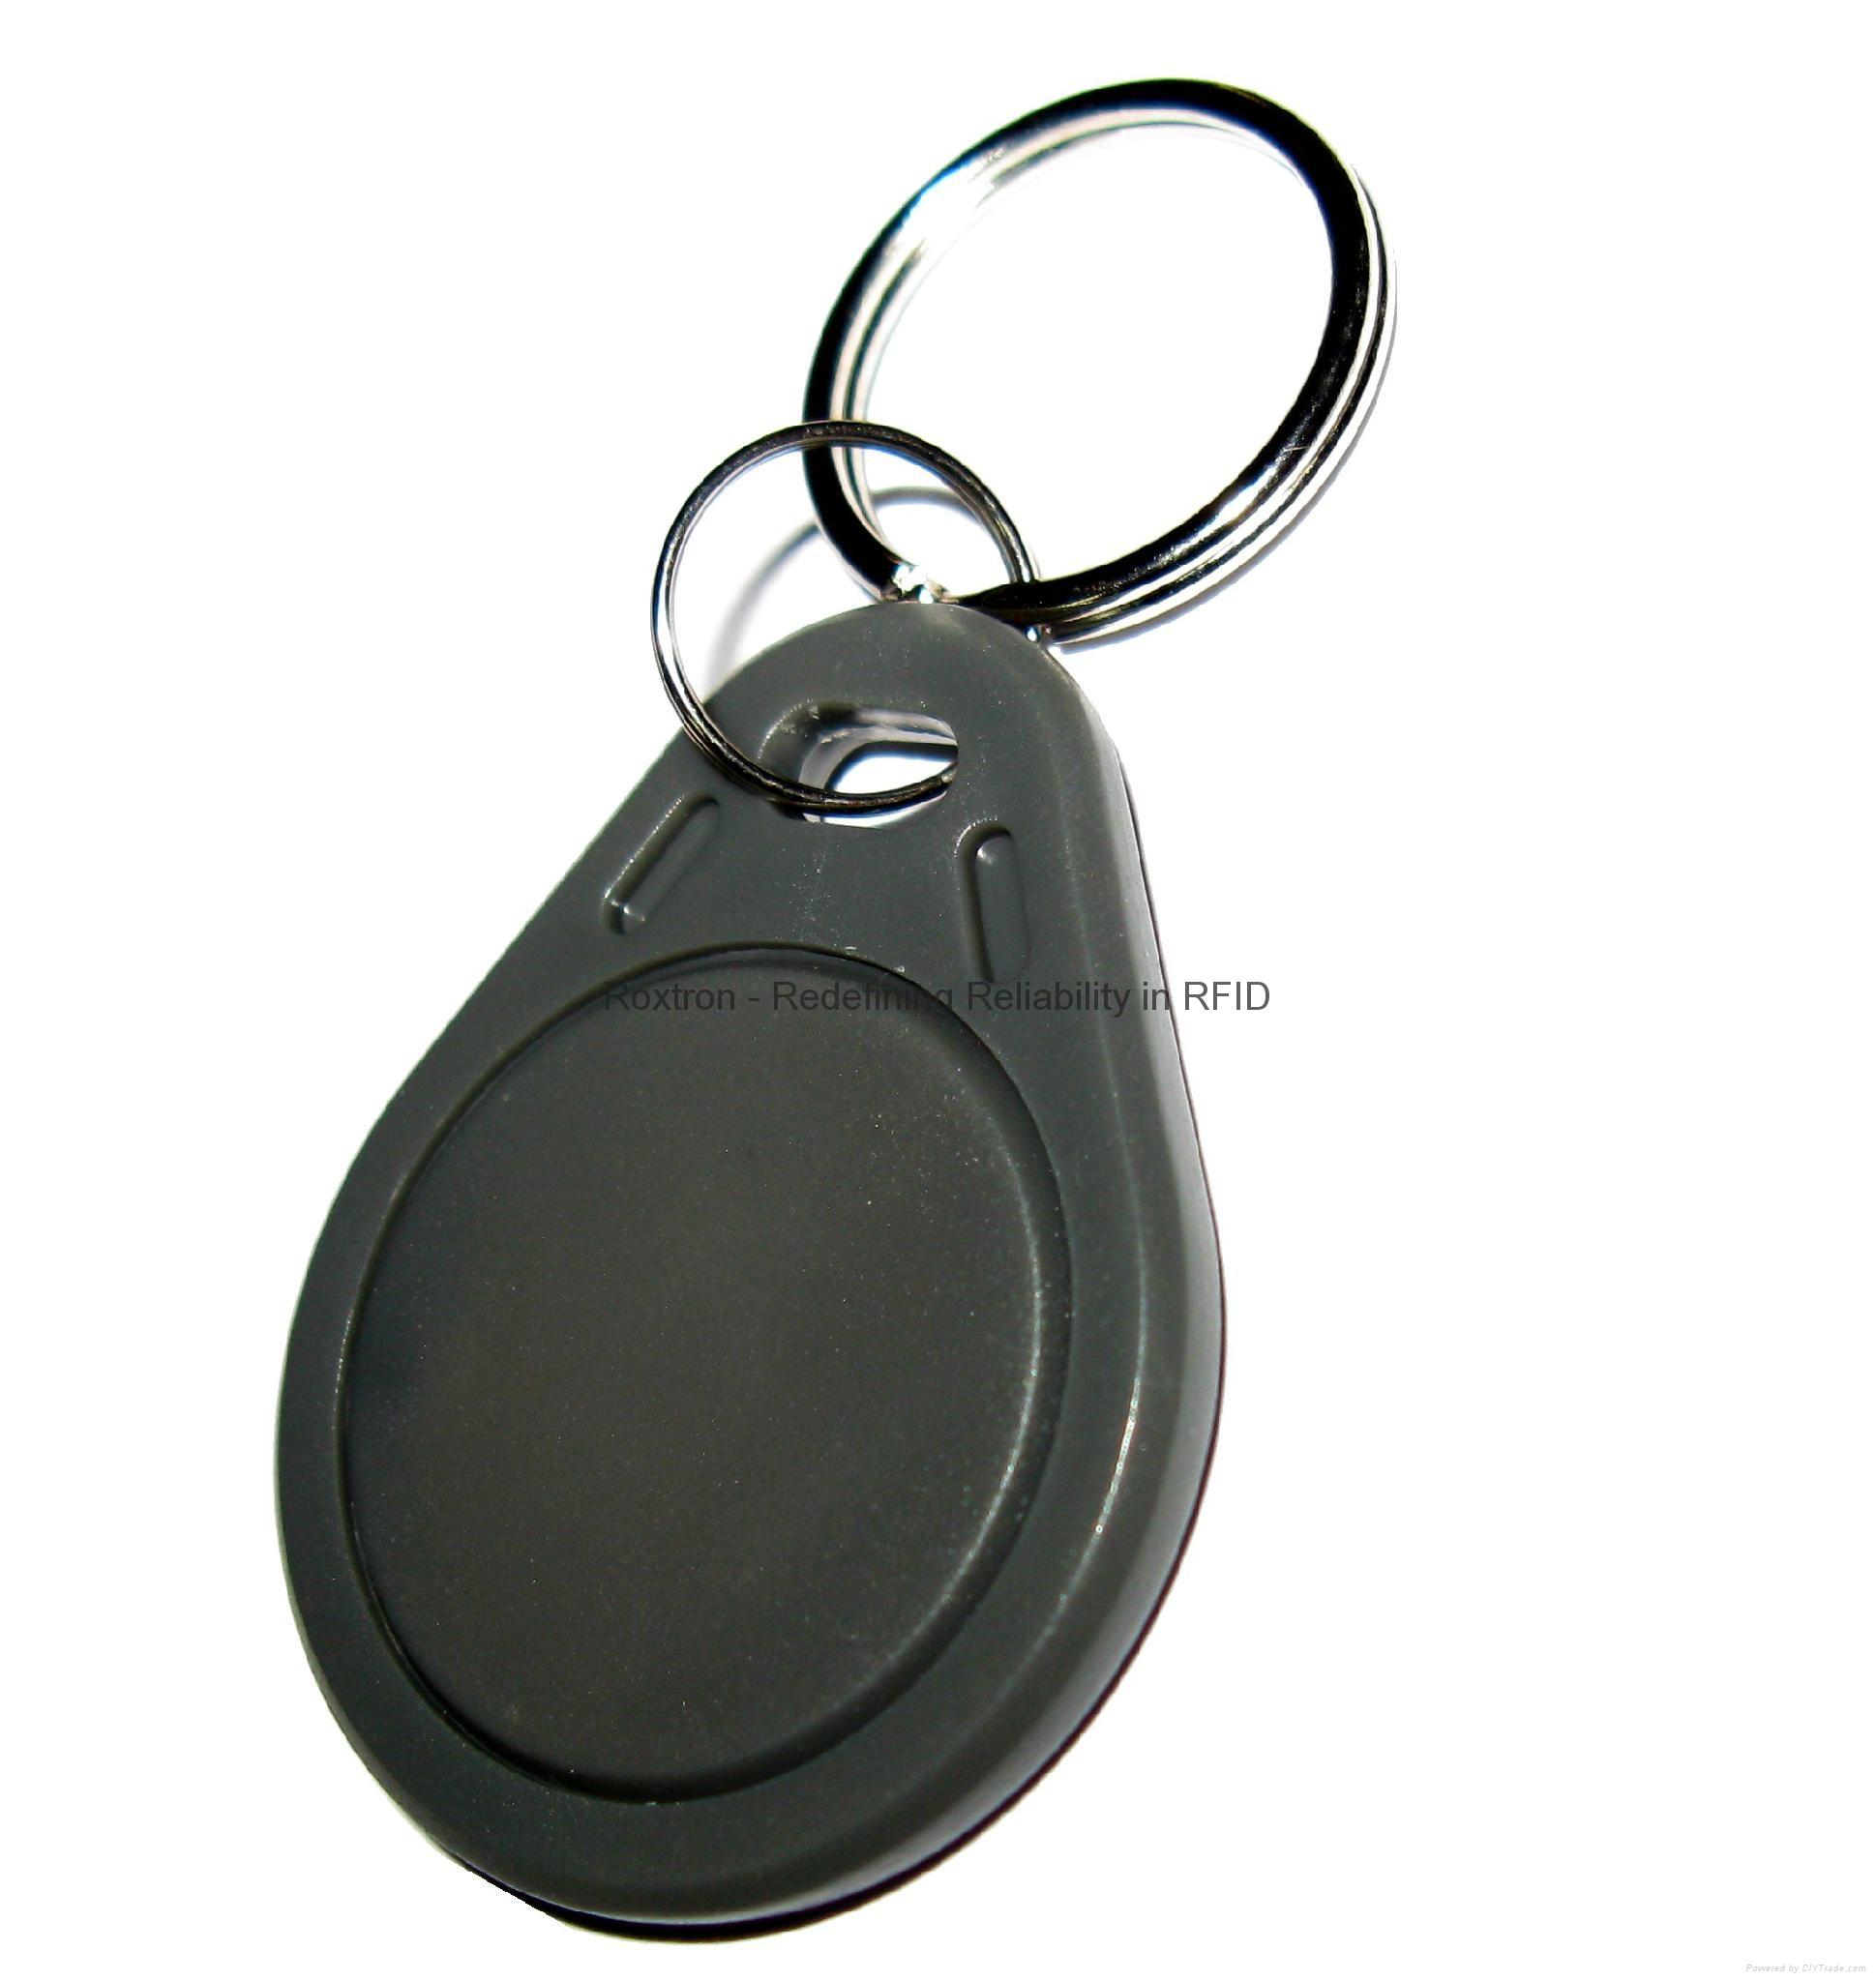 TK4100 RXK04 Key Tag 11